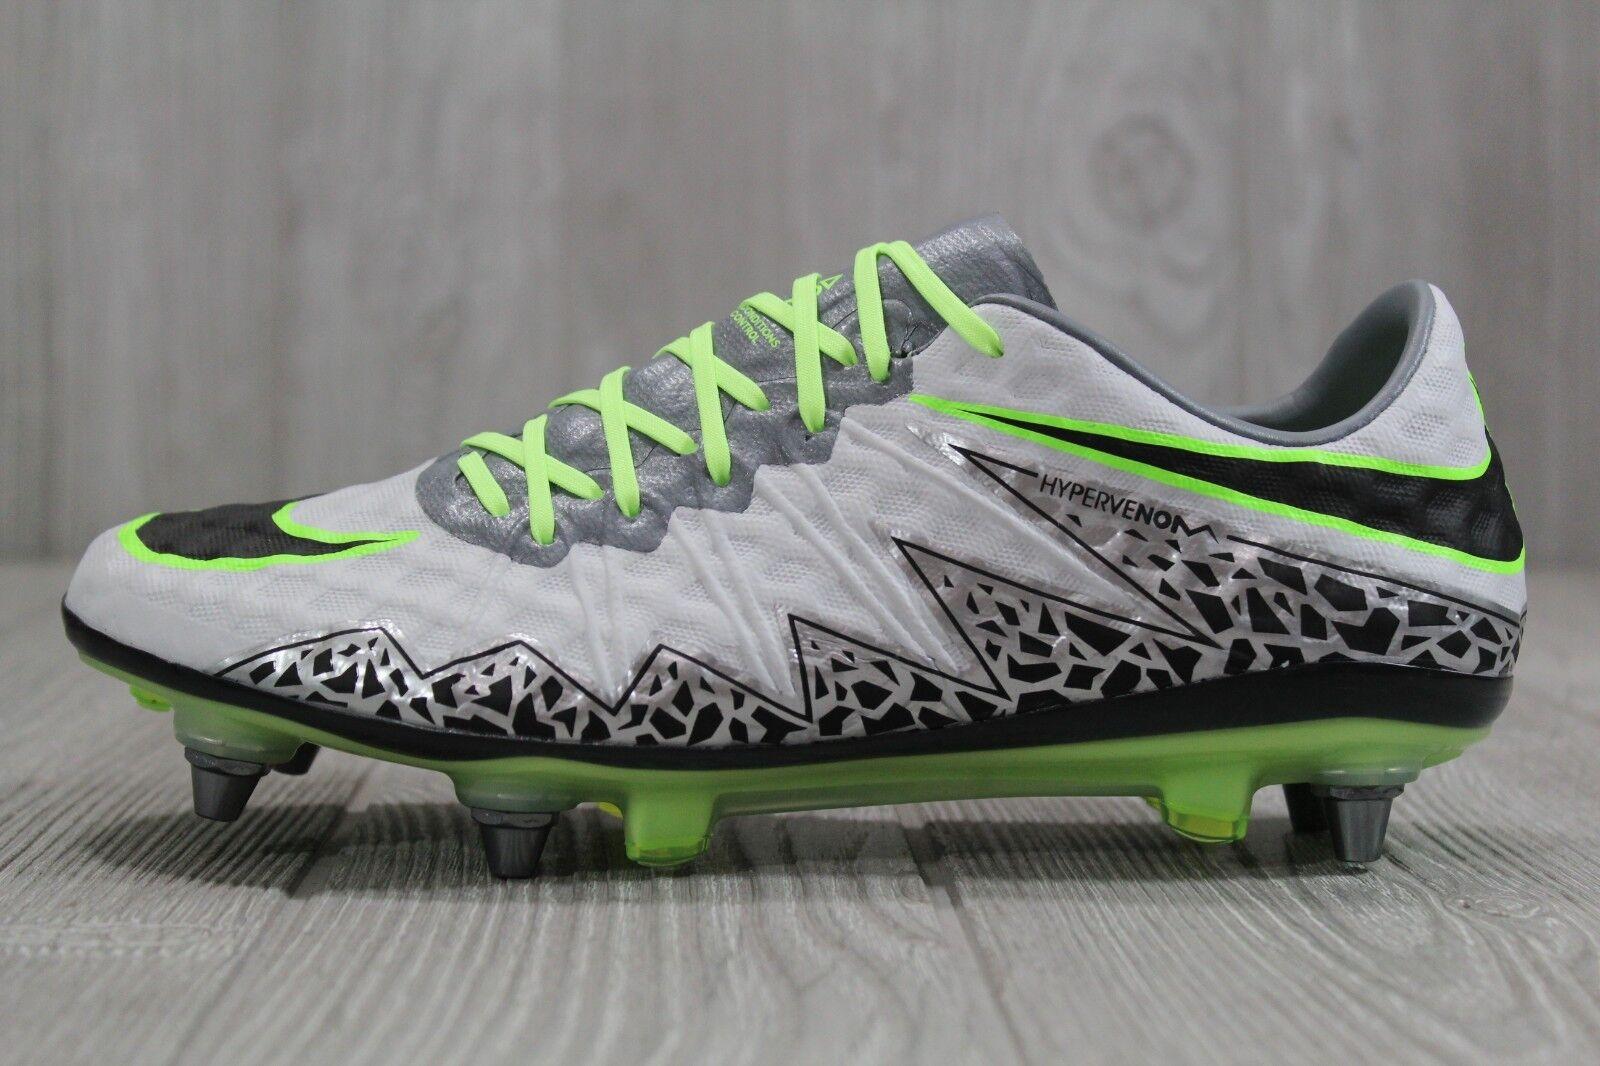 37 Nike Hypervenom Phinish SG-Pro Soccer Cleats Mens Sz 6 (Wmns 7.5) 768898 004